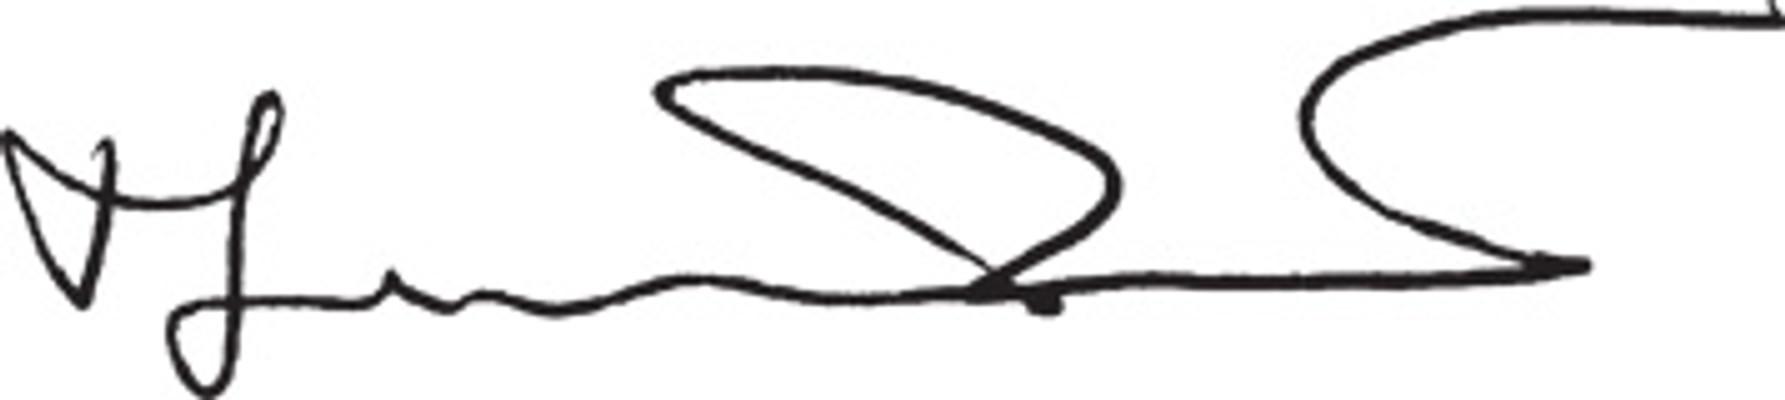 f0004-02